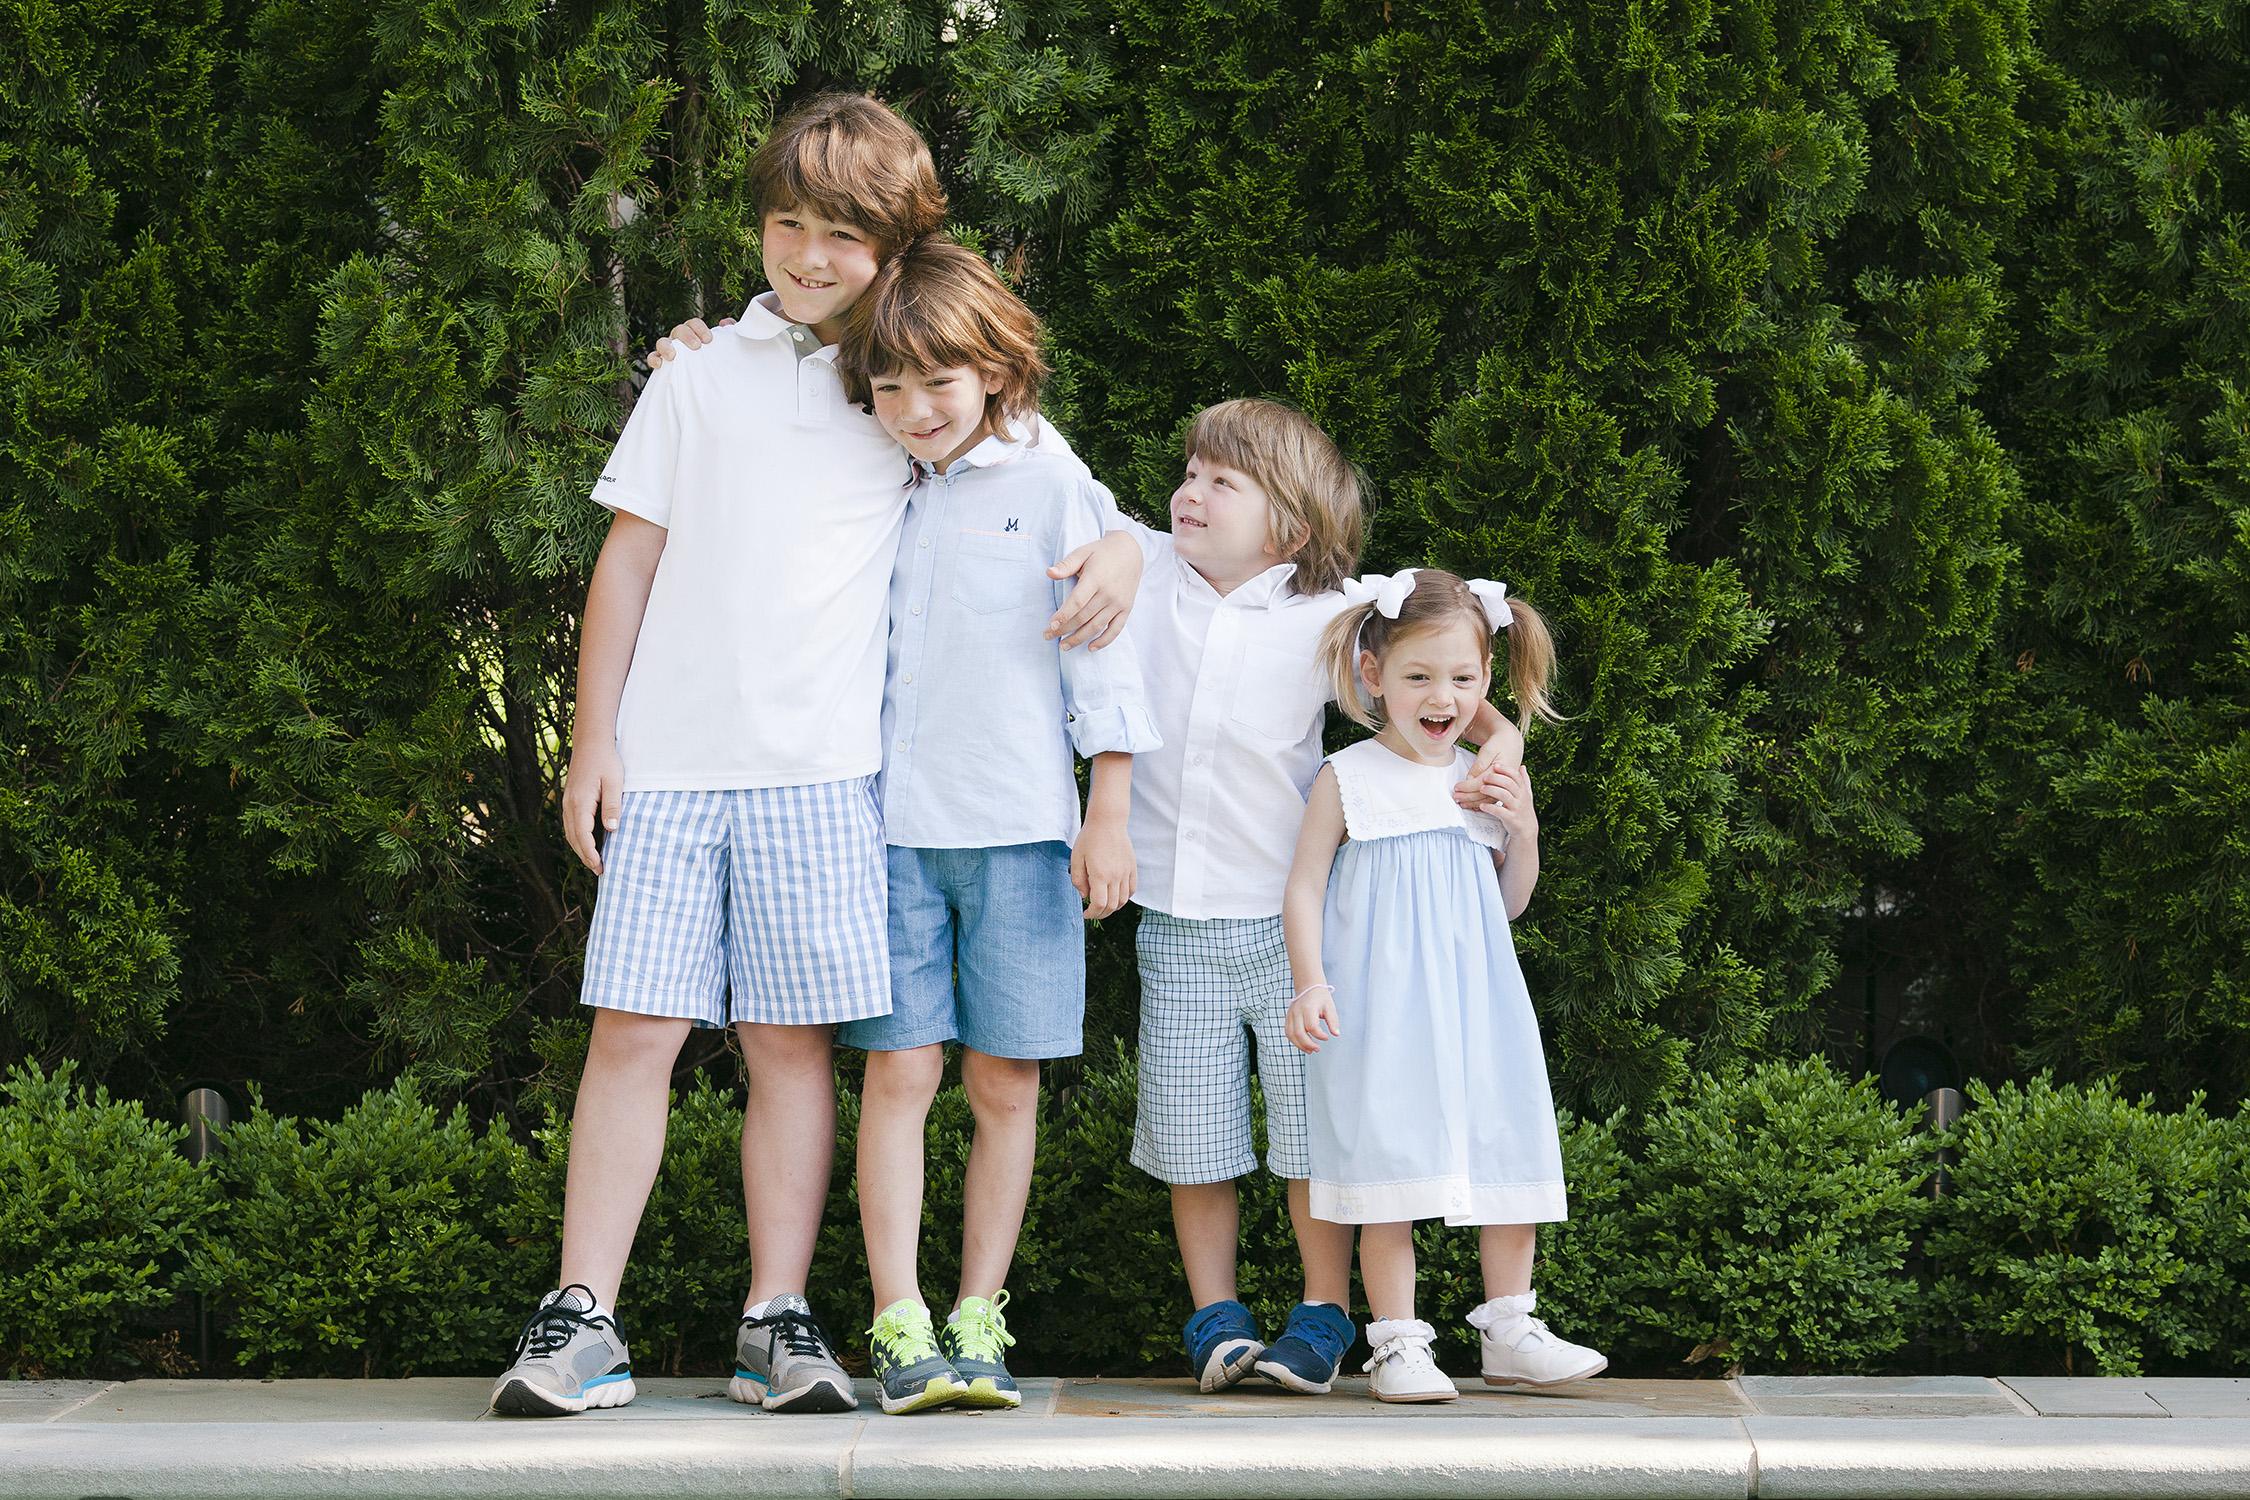 modern-washington-dc-northern-virginia-children-family-maternity-photography-contempo-kids-photo-brothers-sister.jpg